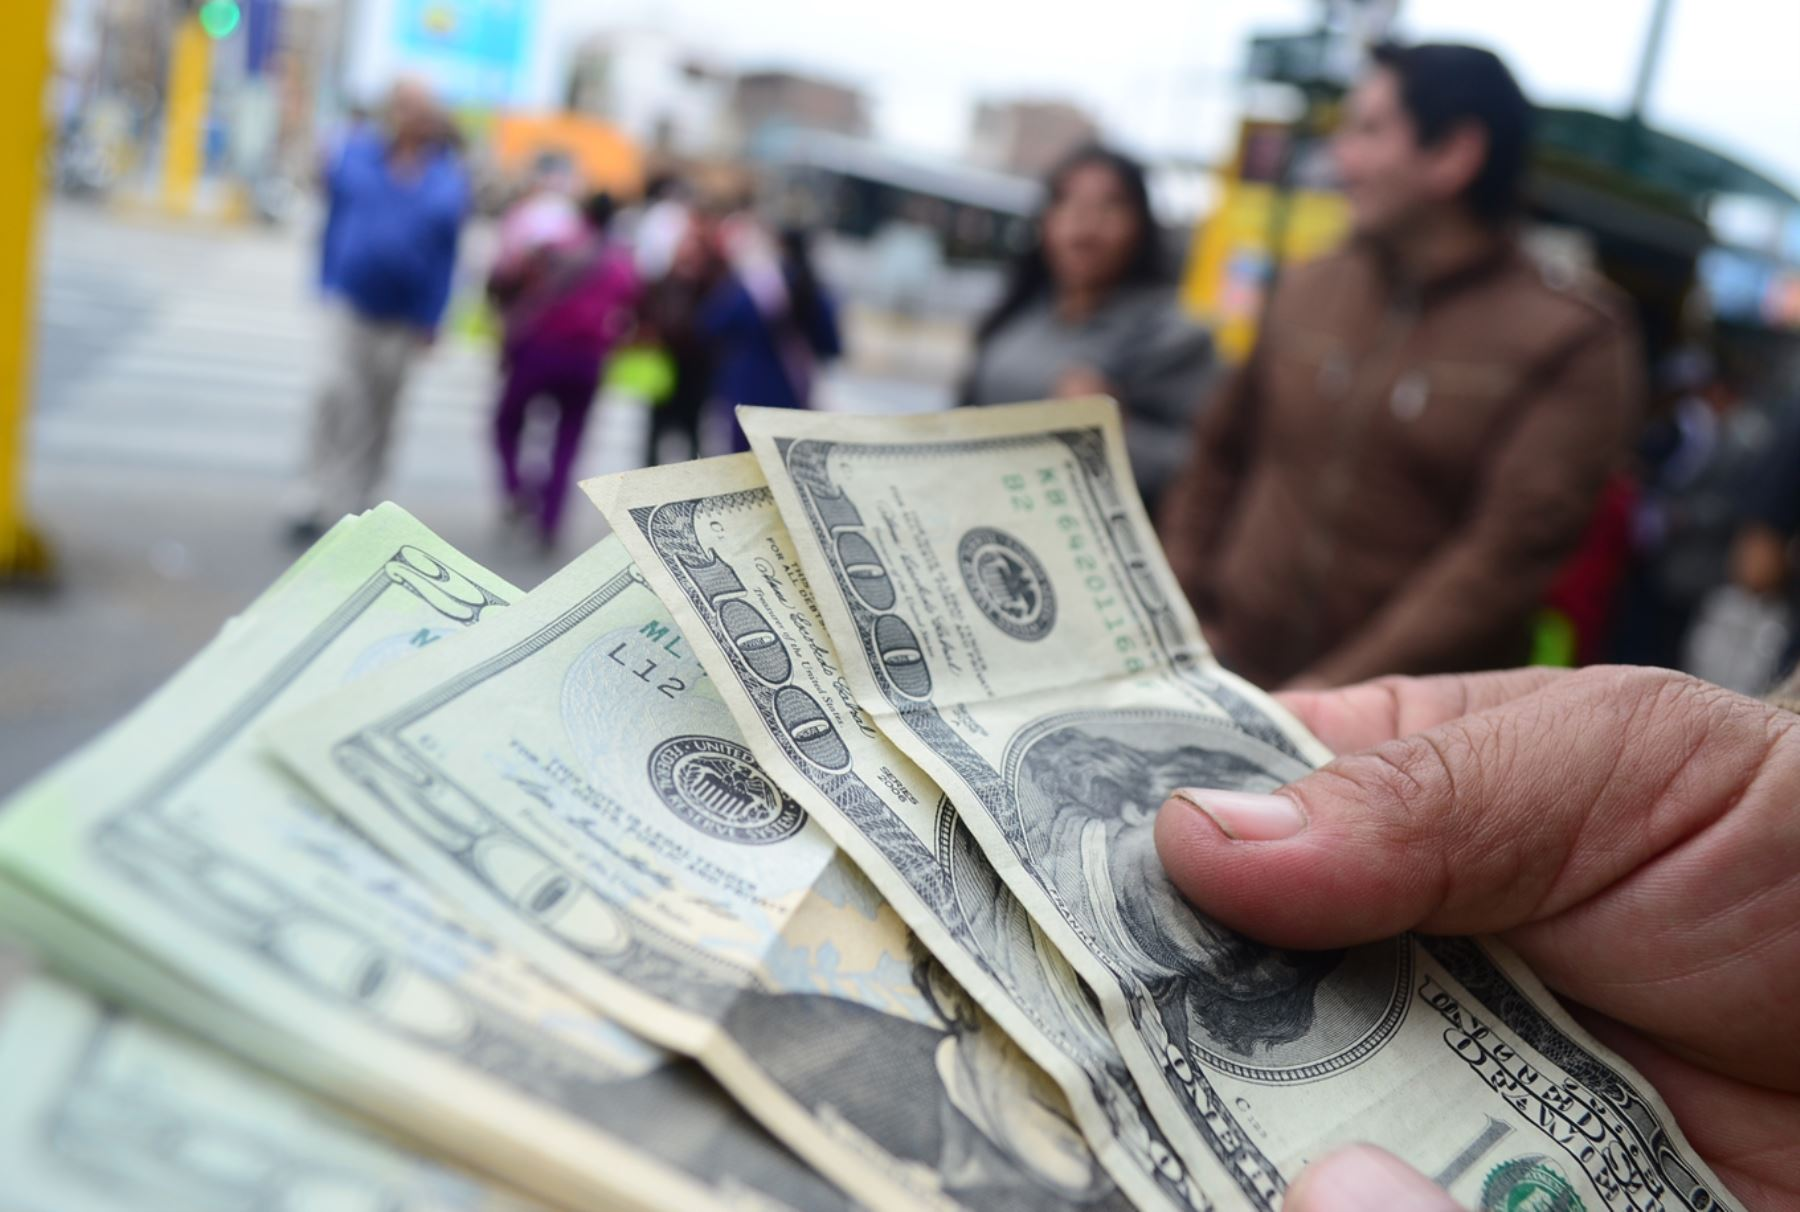 Bloomberg: 'Darwinian Dollarization in Venezuela'